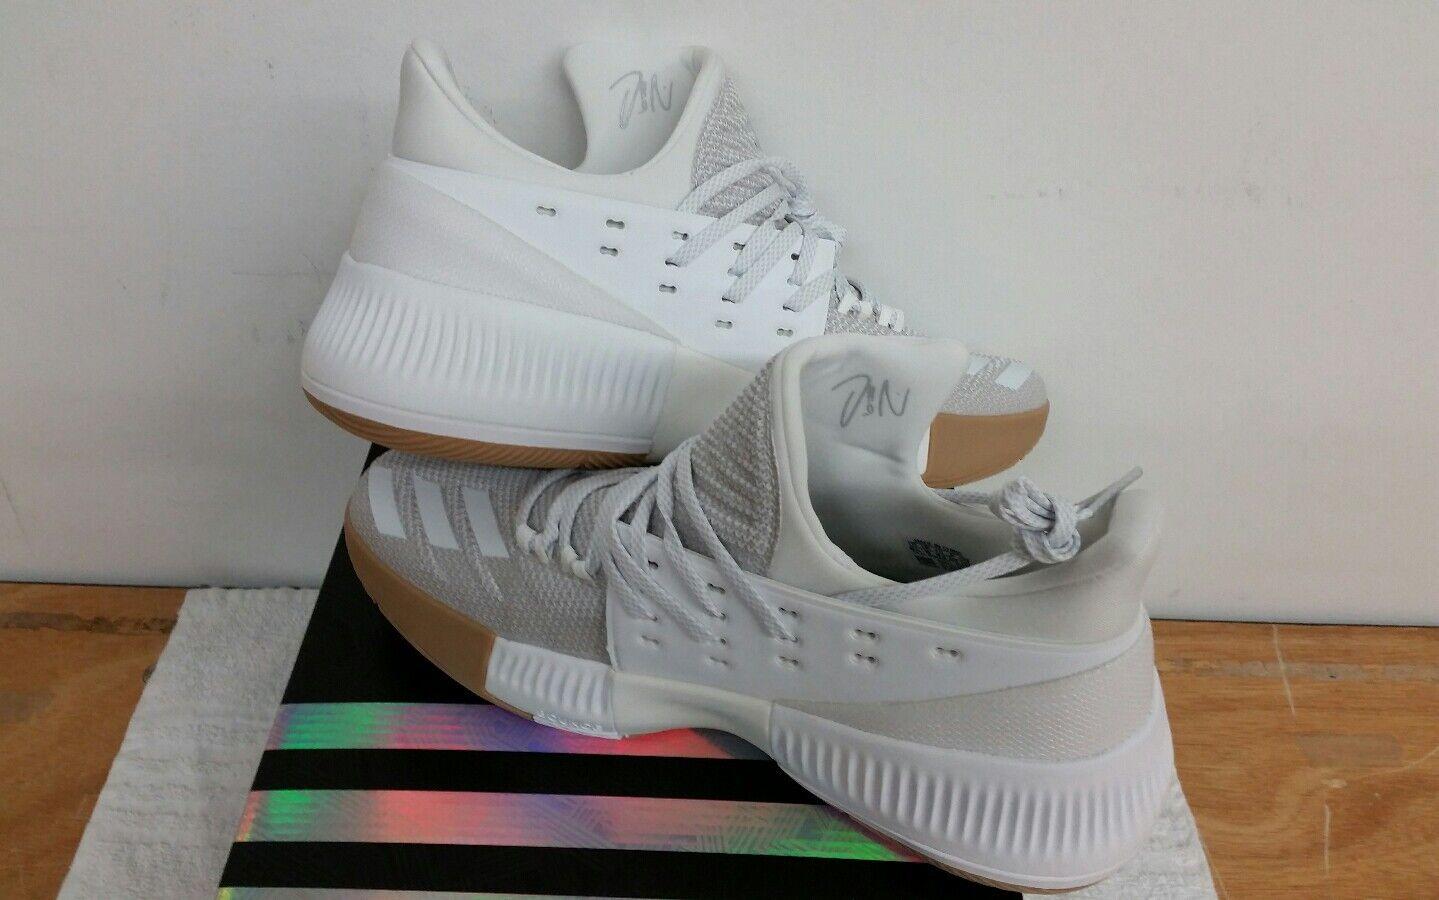 Adidas D Lillard 3 DAME Basketball Shoes 2018 - NEW - Size 9 BW0323